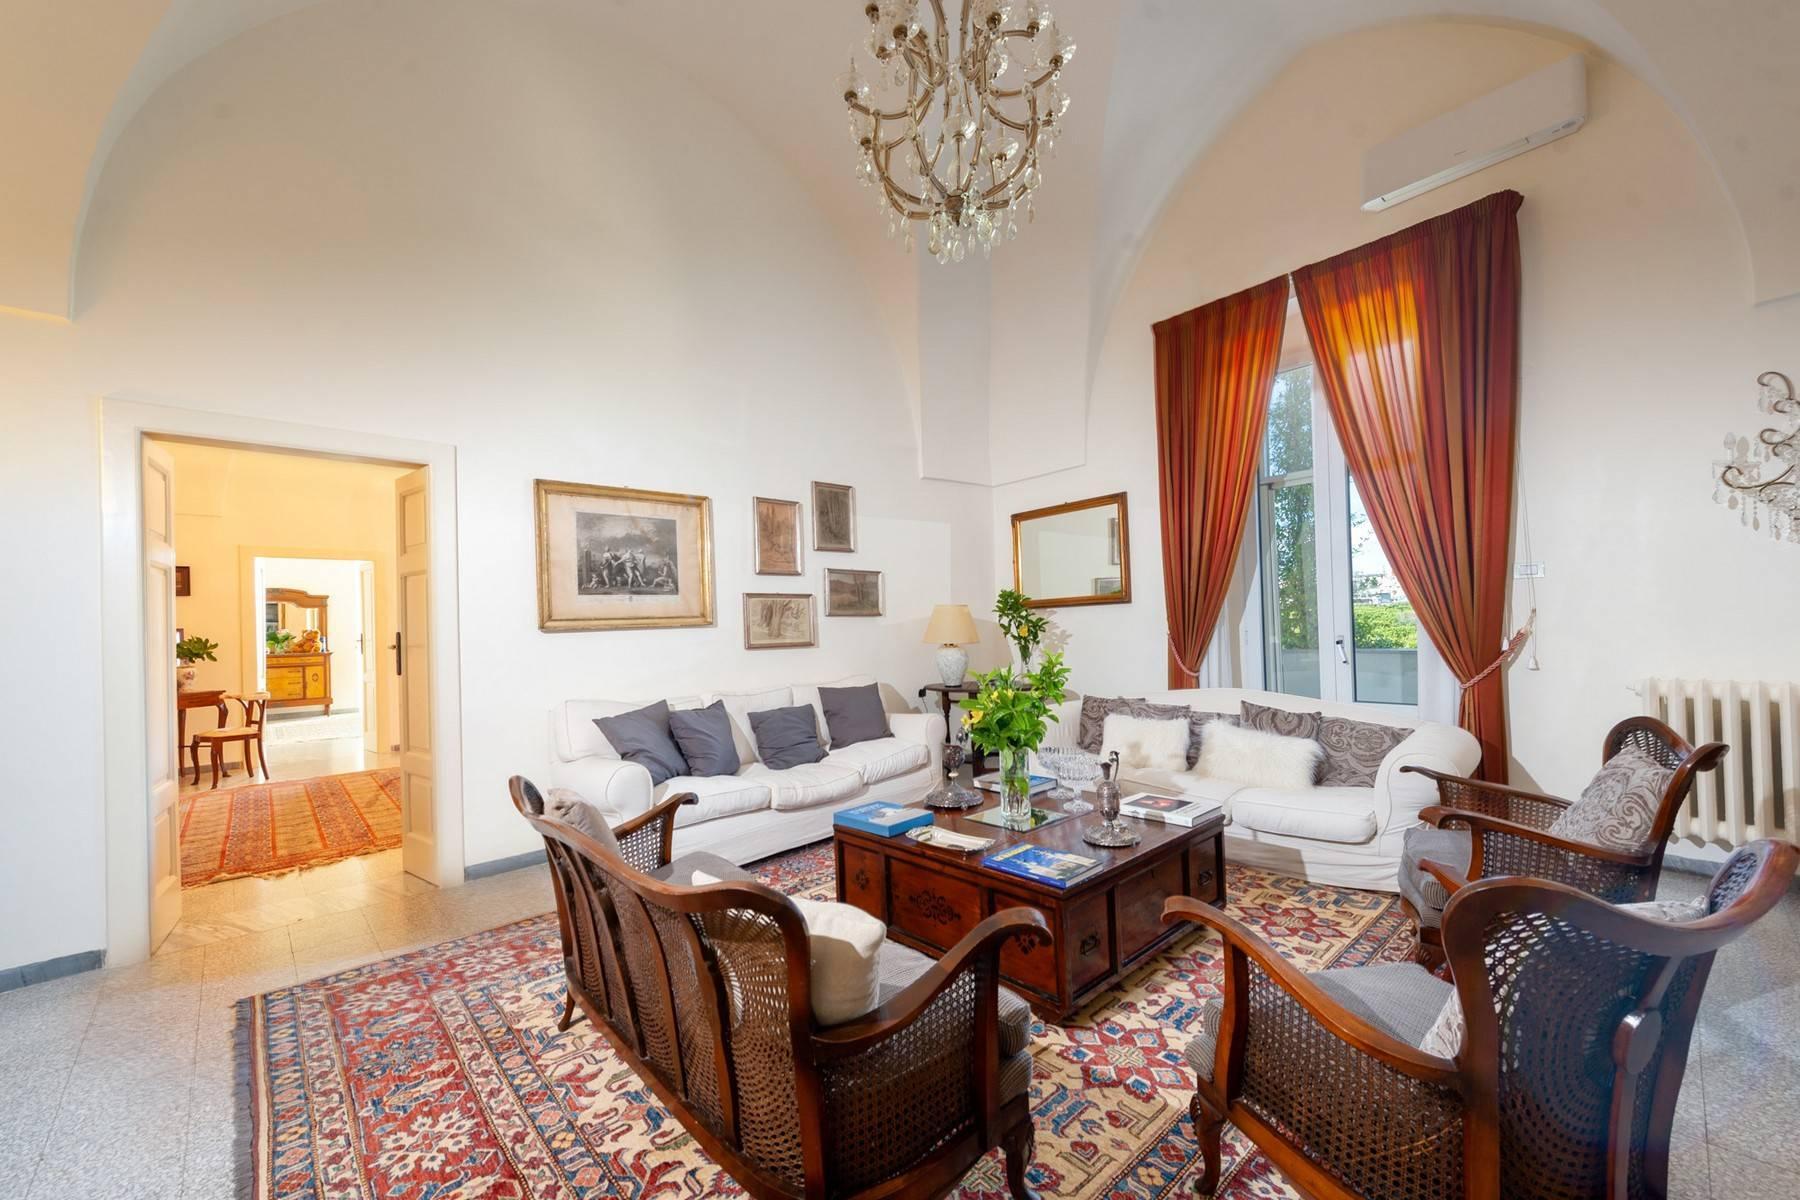 Splendida villa gentilizia del '600 circondata da agrumeti - 25